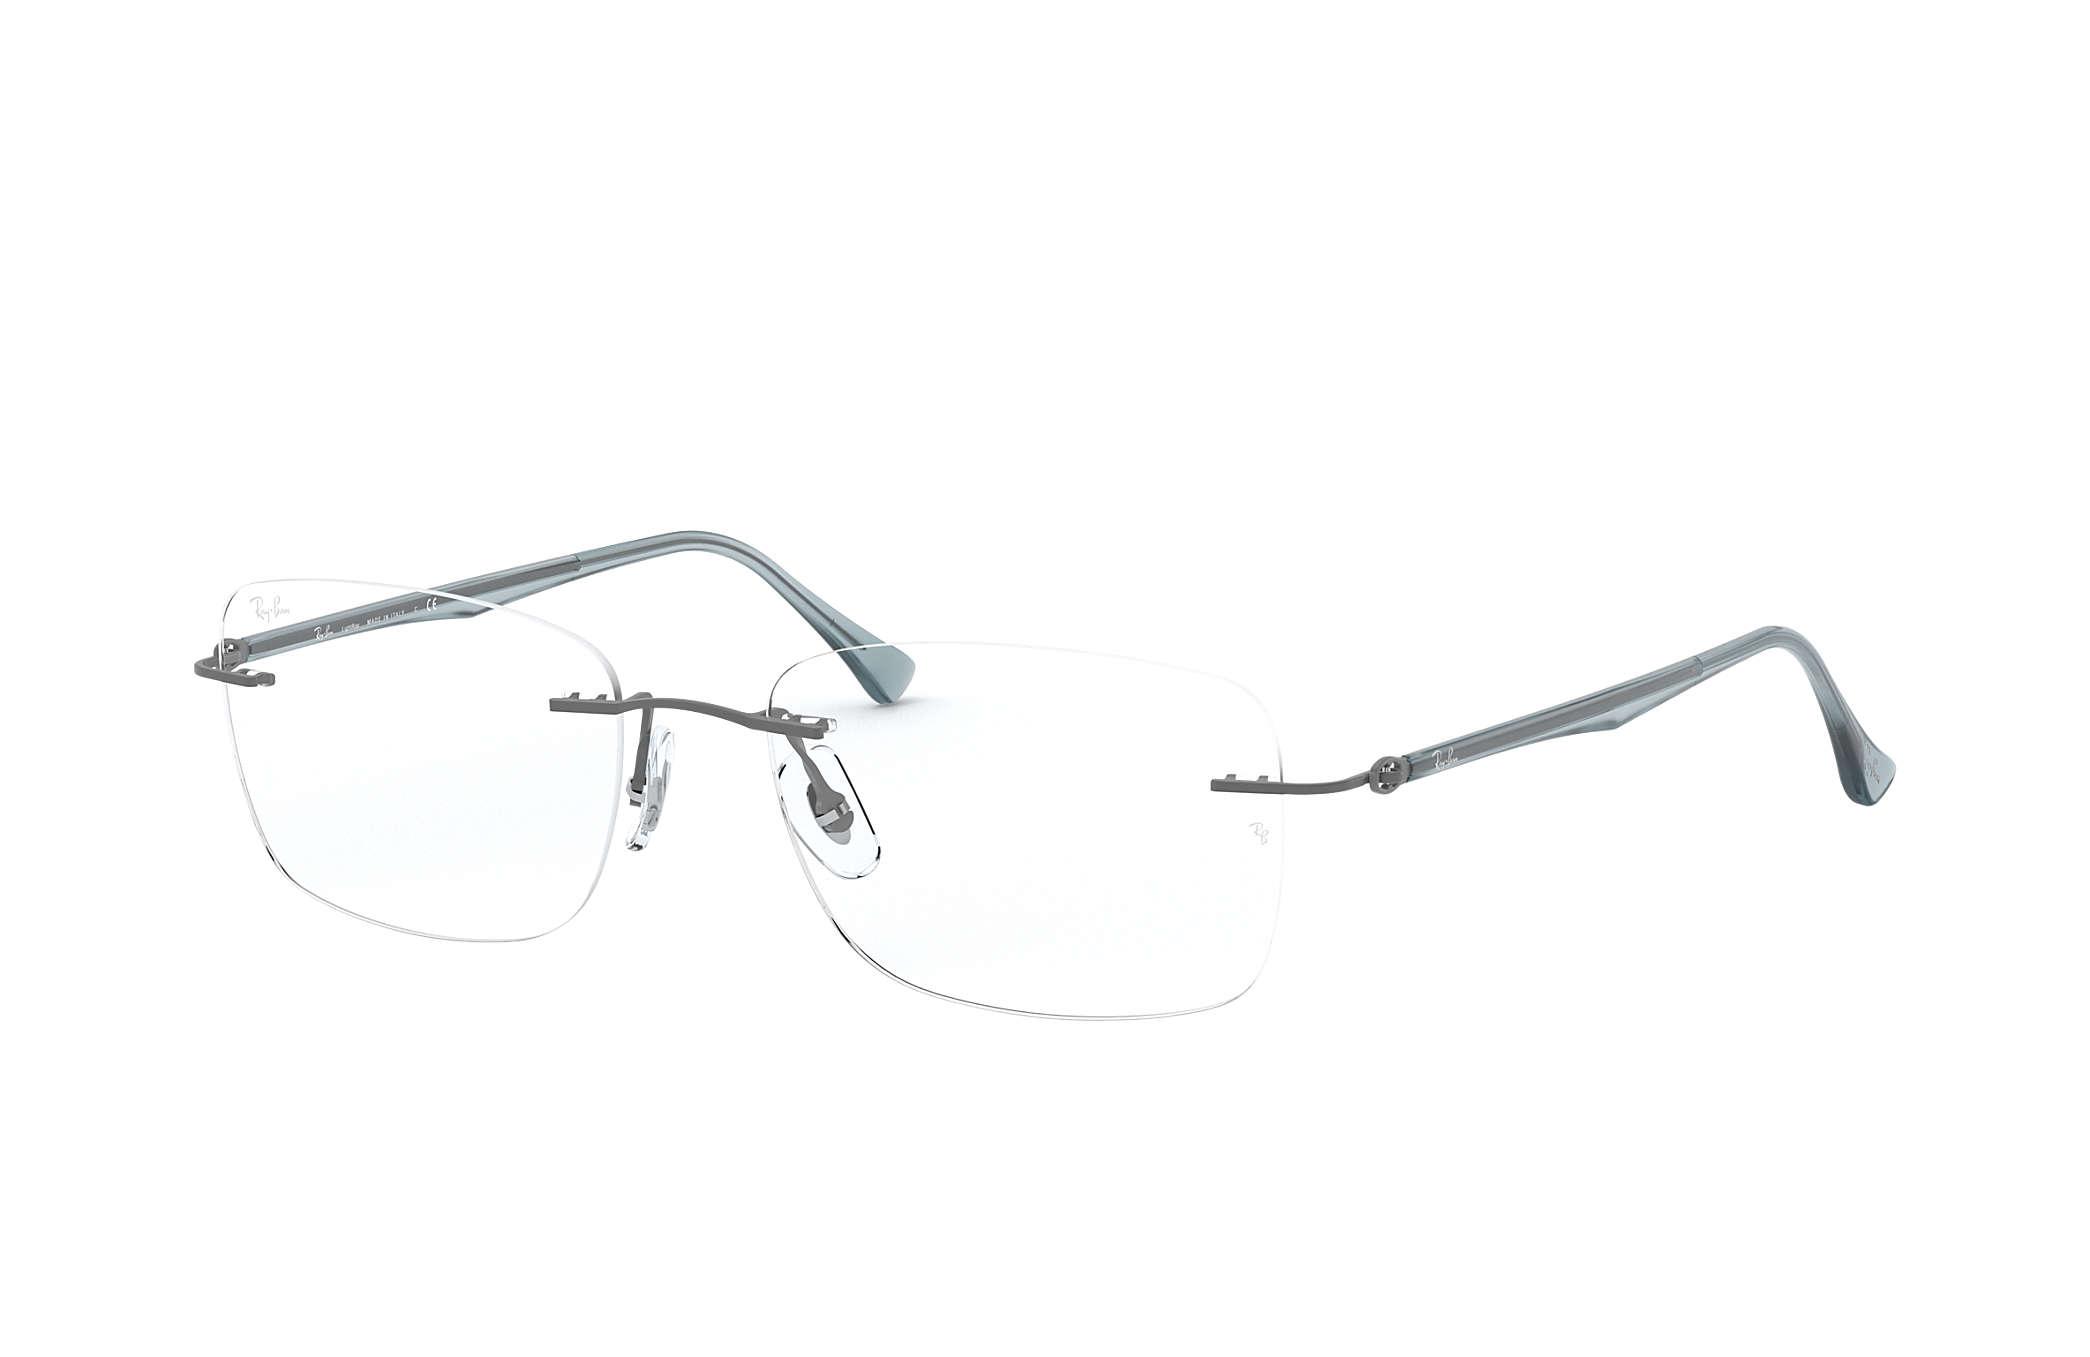 ray ban rimless titanium eyeglass frames  220.00